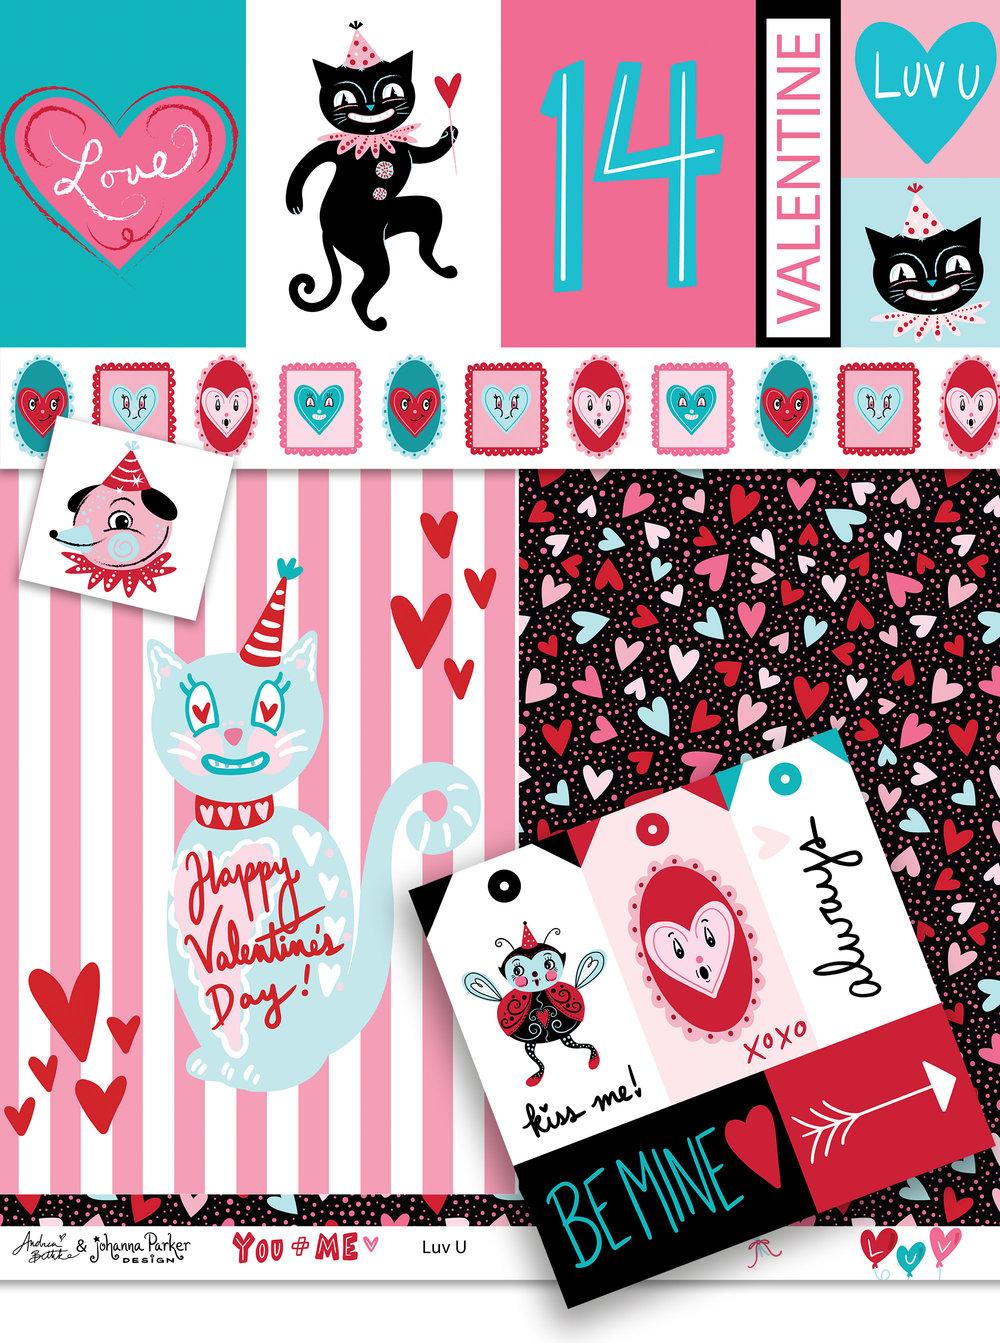 Andrea-Bethke-Johanna-Parker-Valentine-Scrapbooking-Designs.jpg